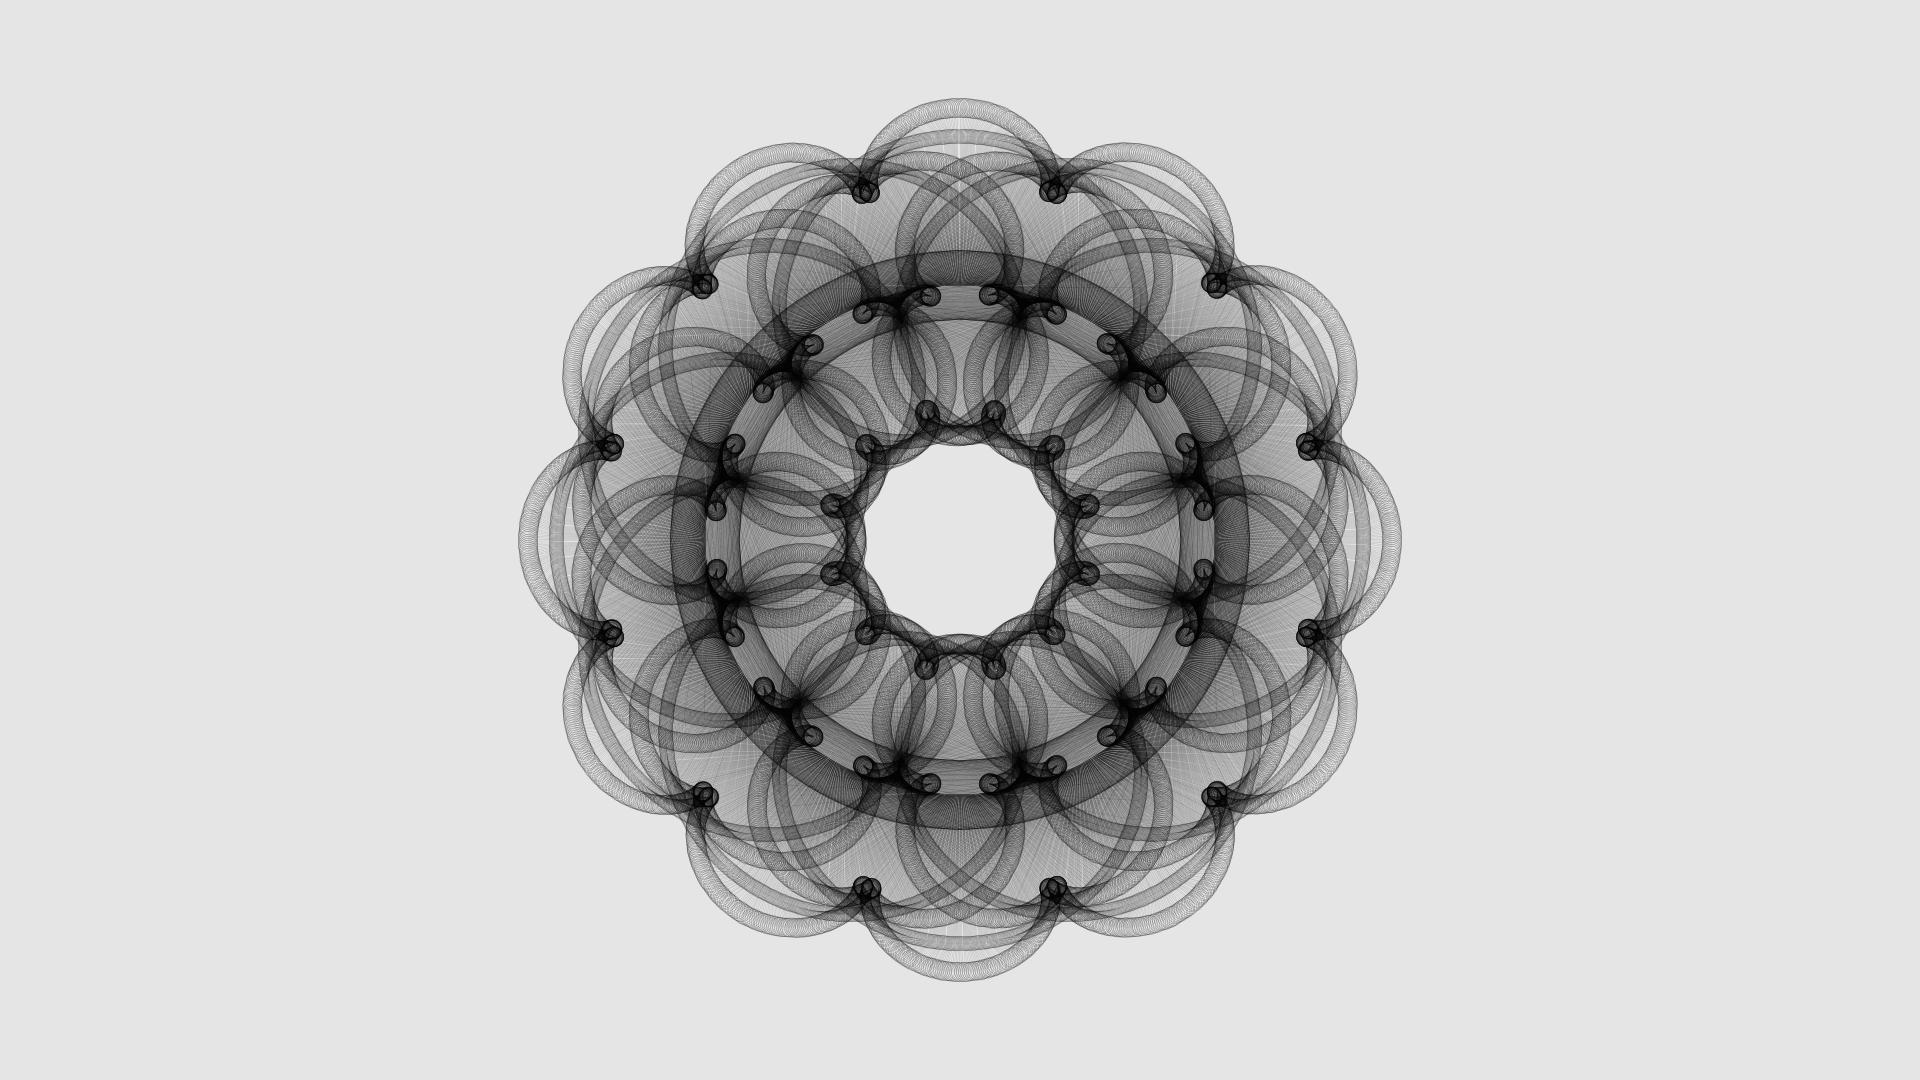 orrery-showlines-showcircles-showearth-M5E12-F12900-1075-215-O254.7392-148.81448-28.446327-D69.0-14.0-19.0.png